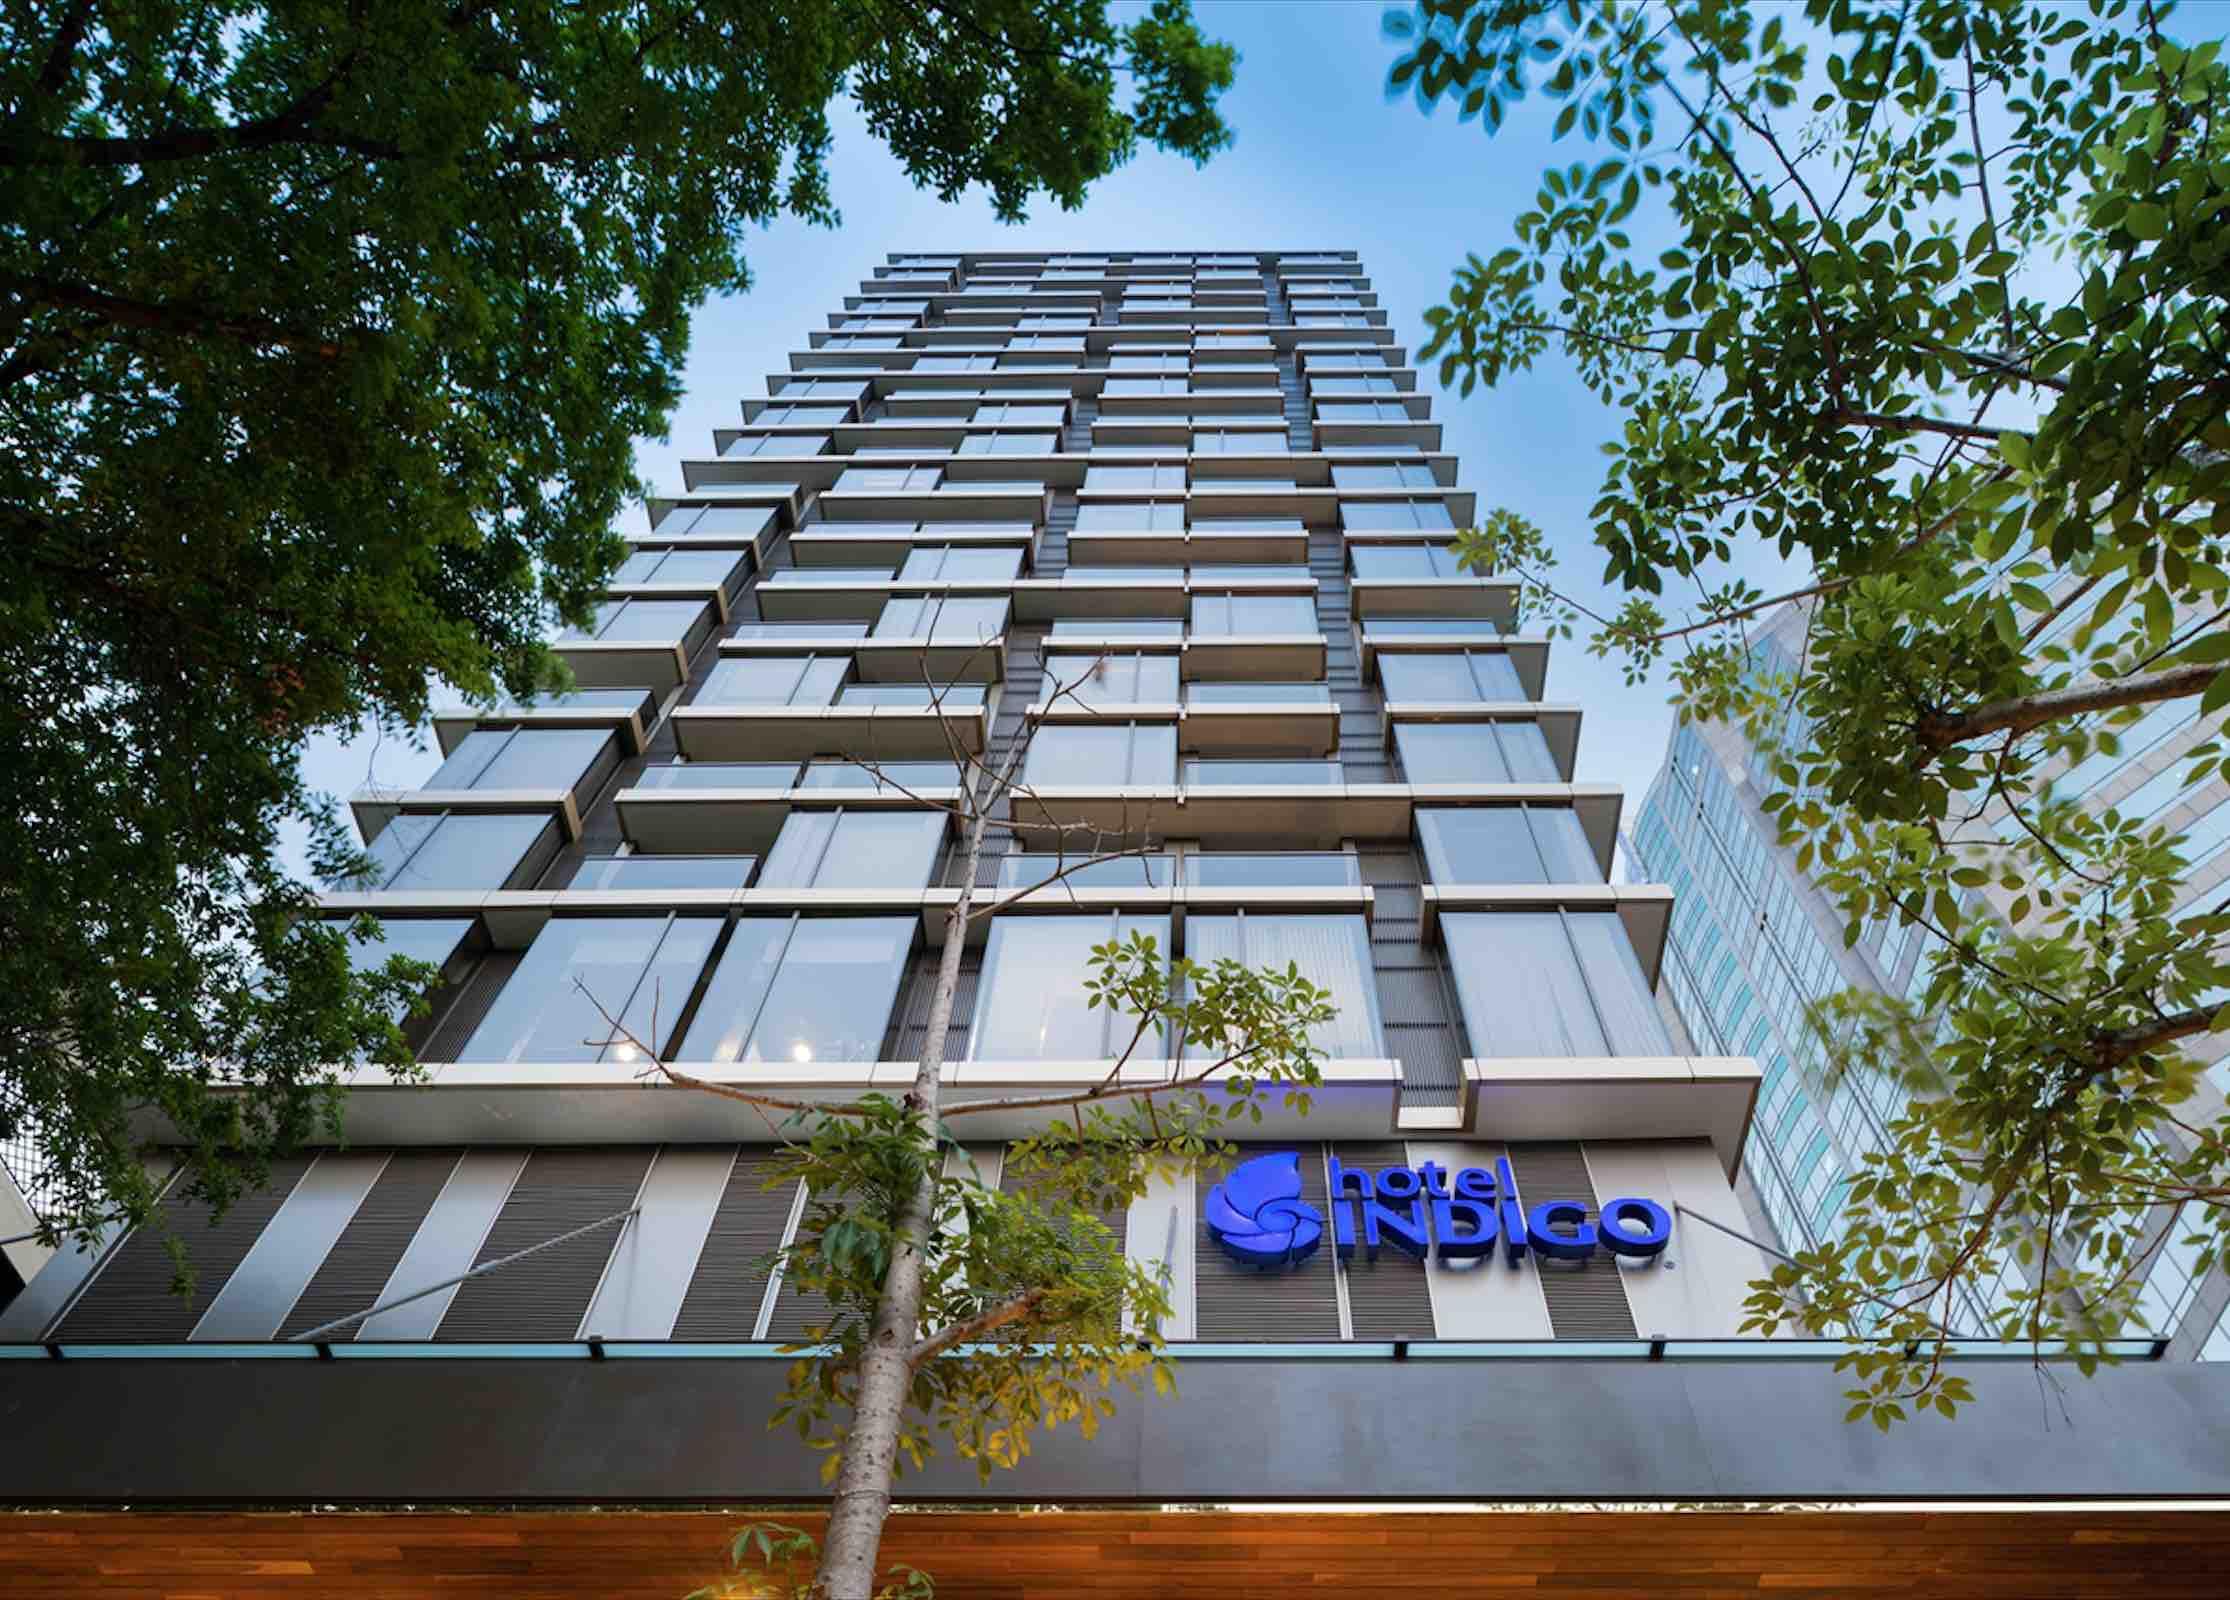 Hotel Indigo Bangkok Exterior - AspirantSG